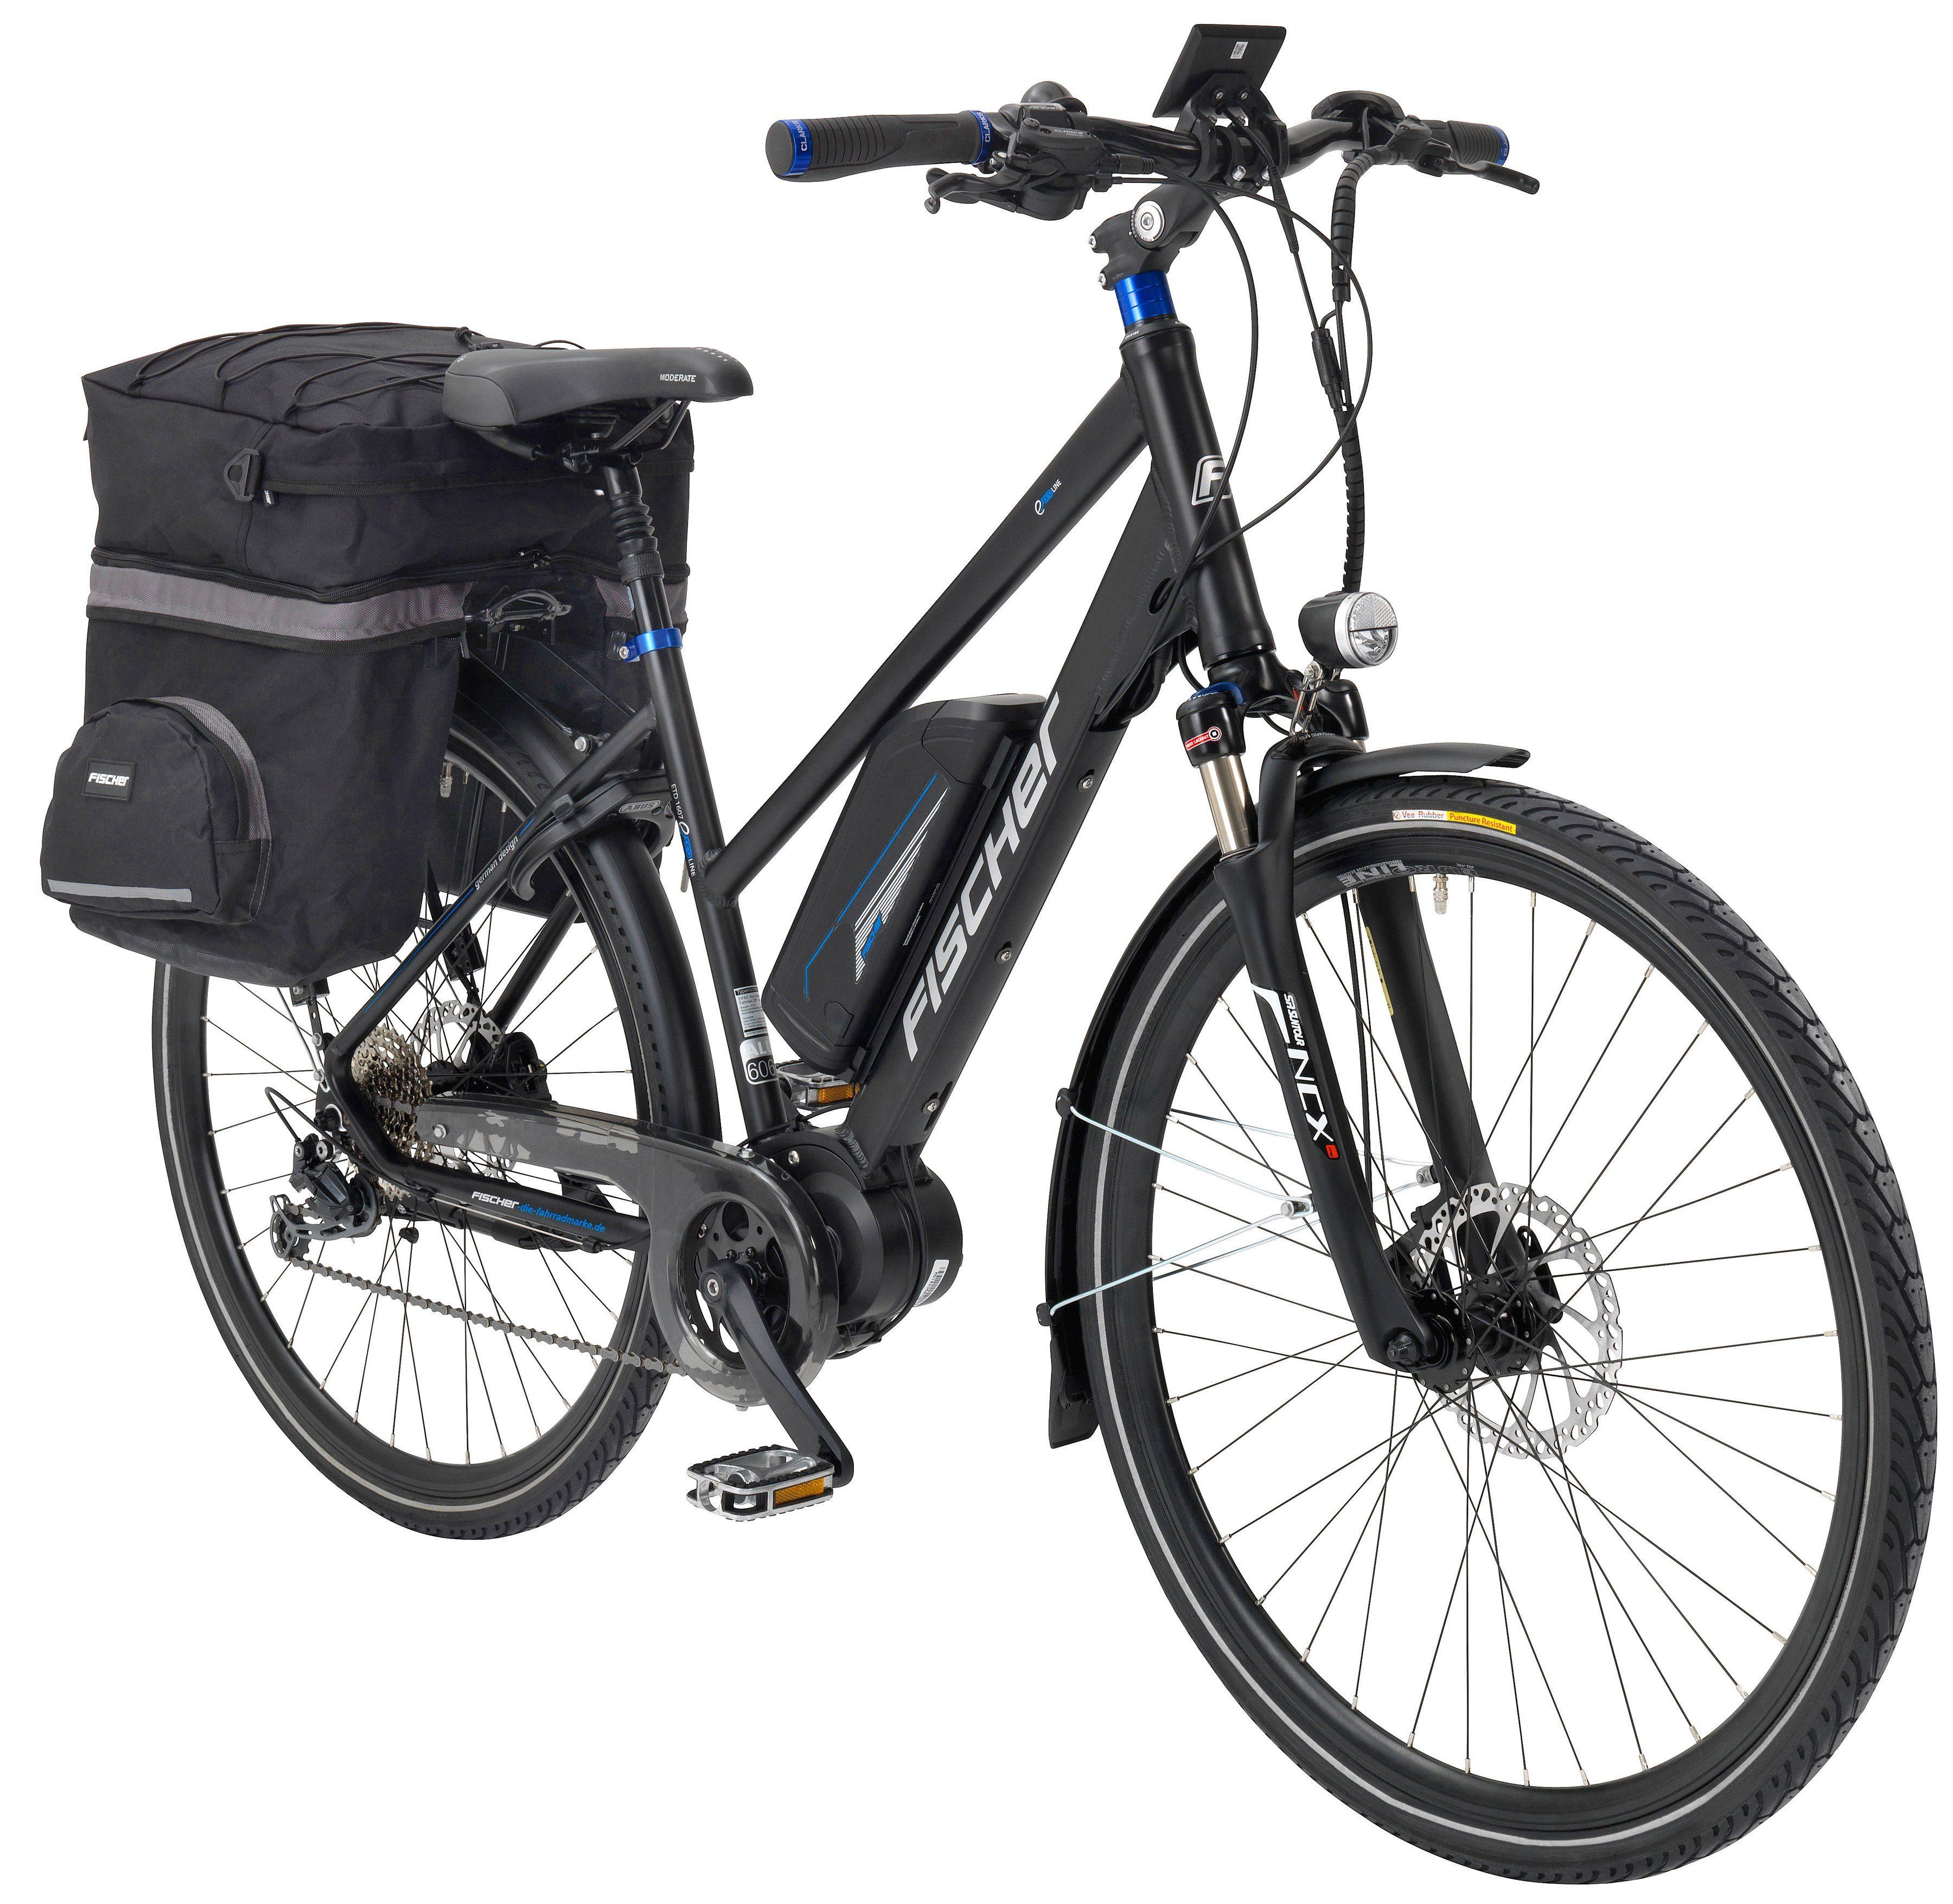 FISCHER FAHRRAEDER E-Bike Trekking Damen »ETD 1607-S2 by Joey Kelly«, 28 Zoll, 9 Gang, Mittelmotor